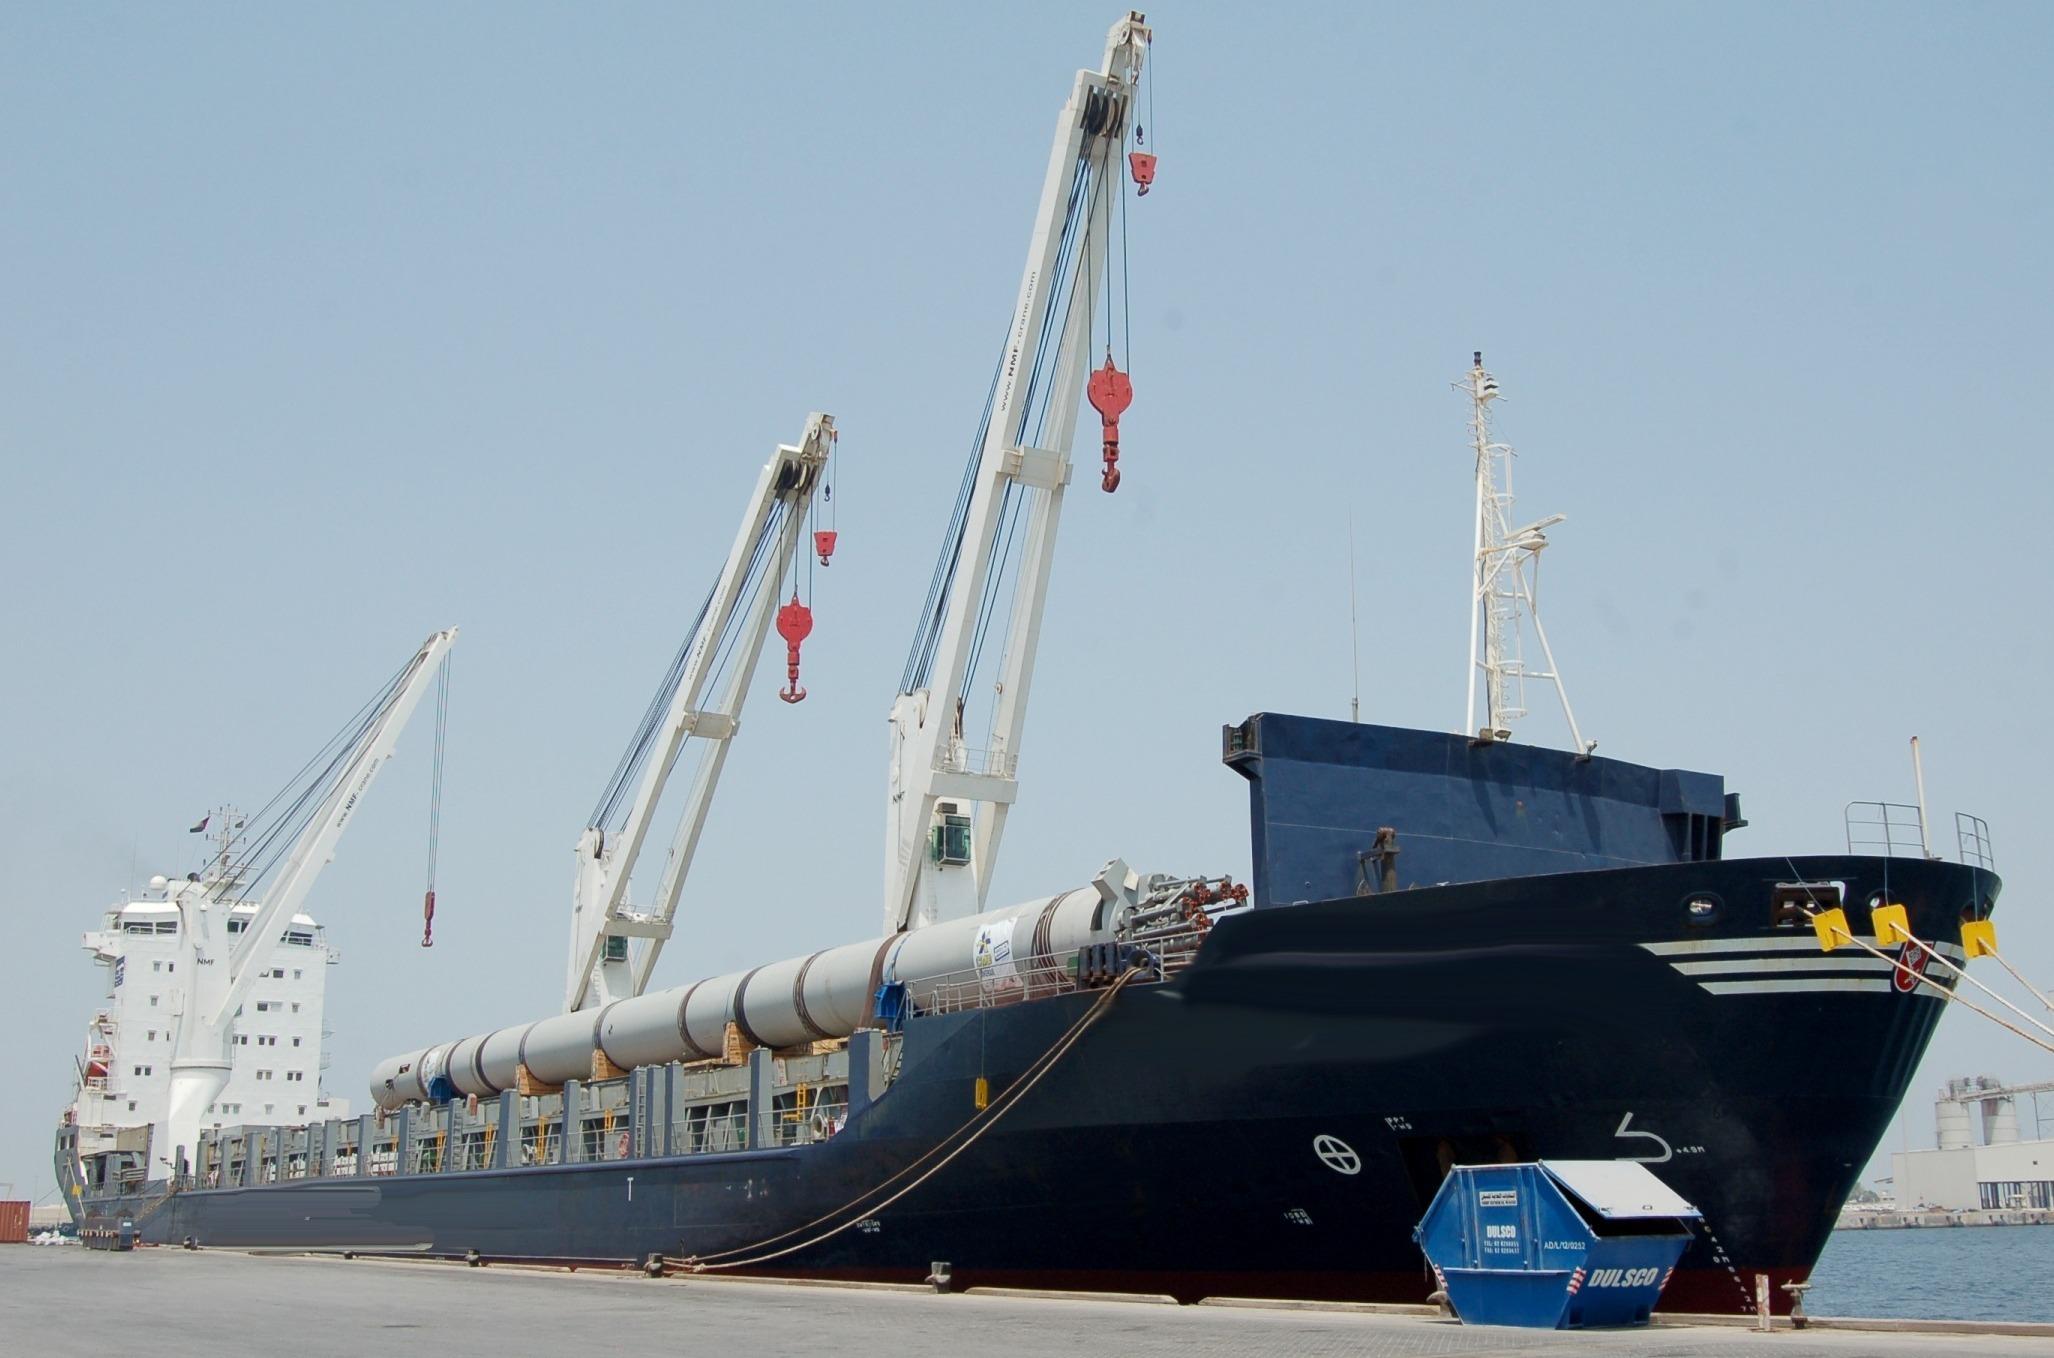 Riser Dunkirk To Abu Dhabi